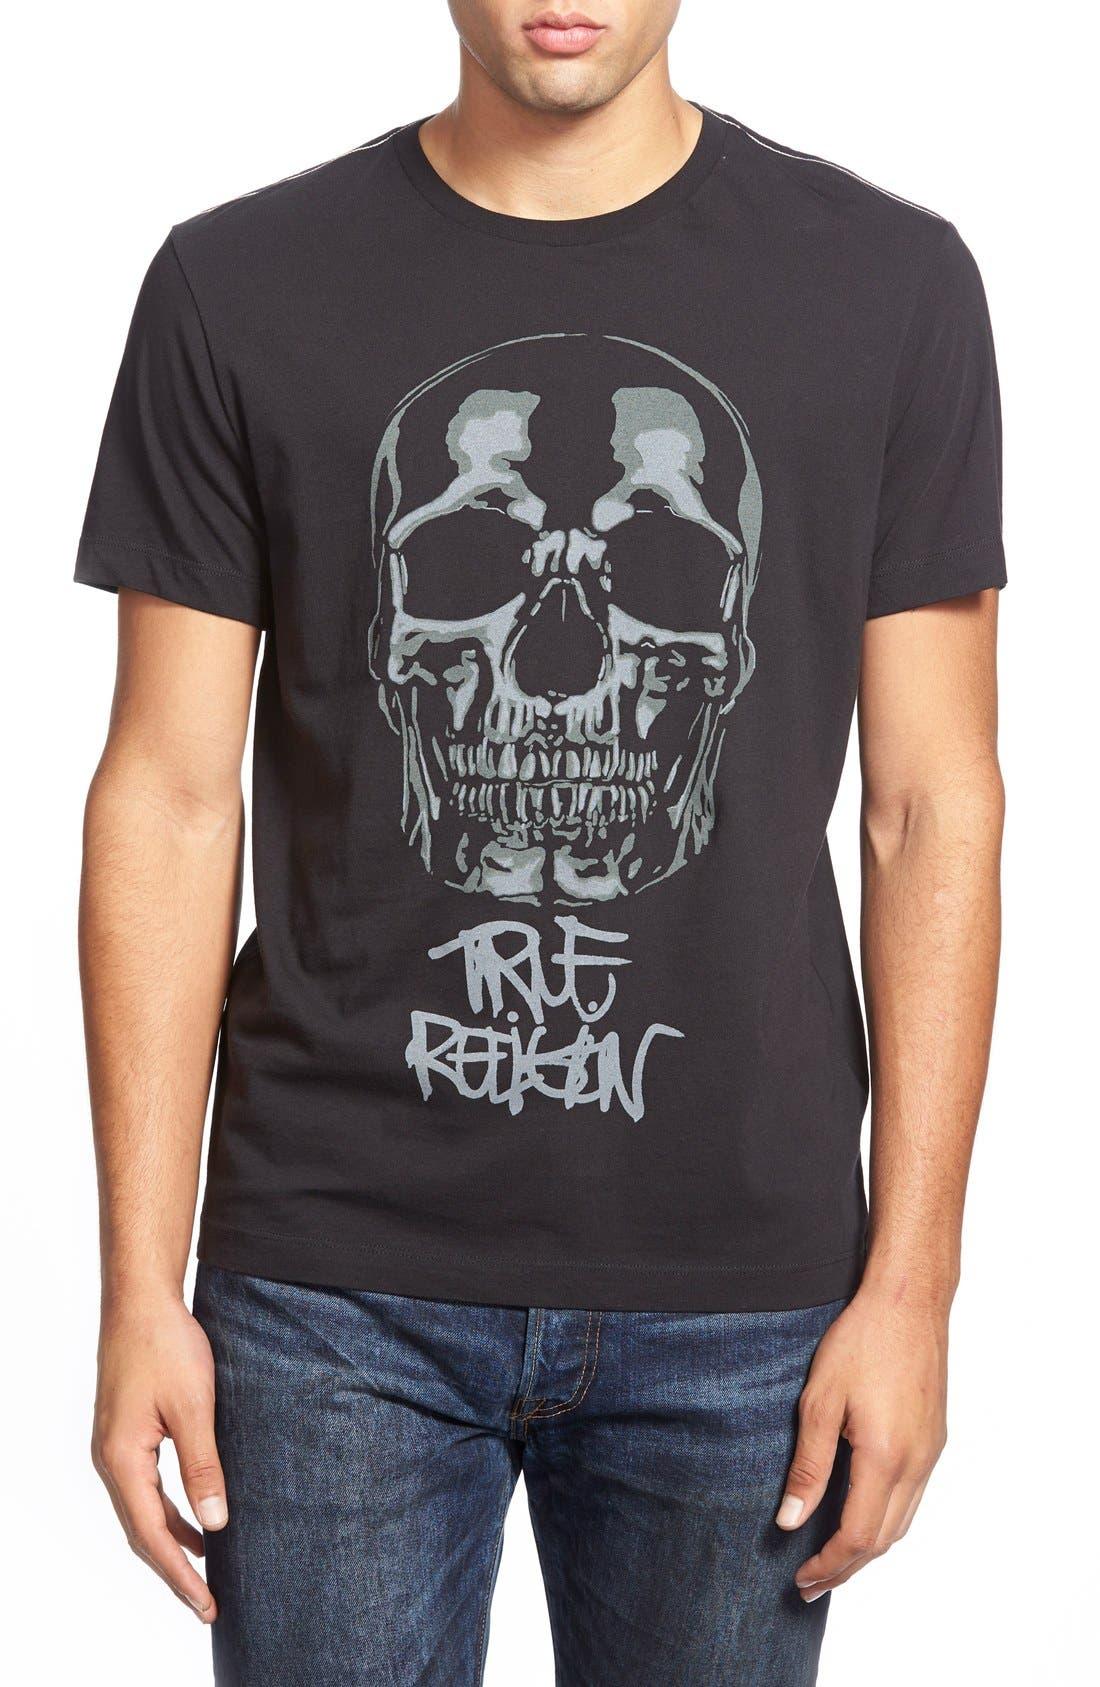 True Religion Brand Jeans 'Graf Skull' Crewneck T-Shirt